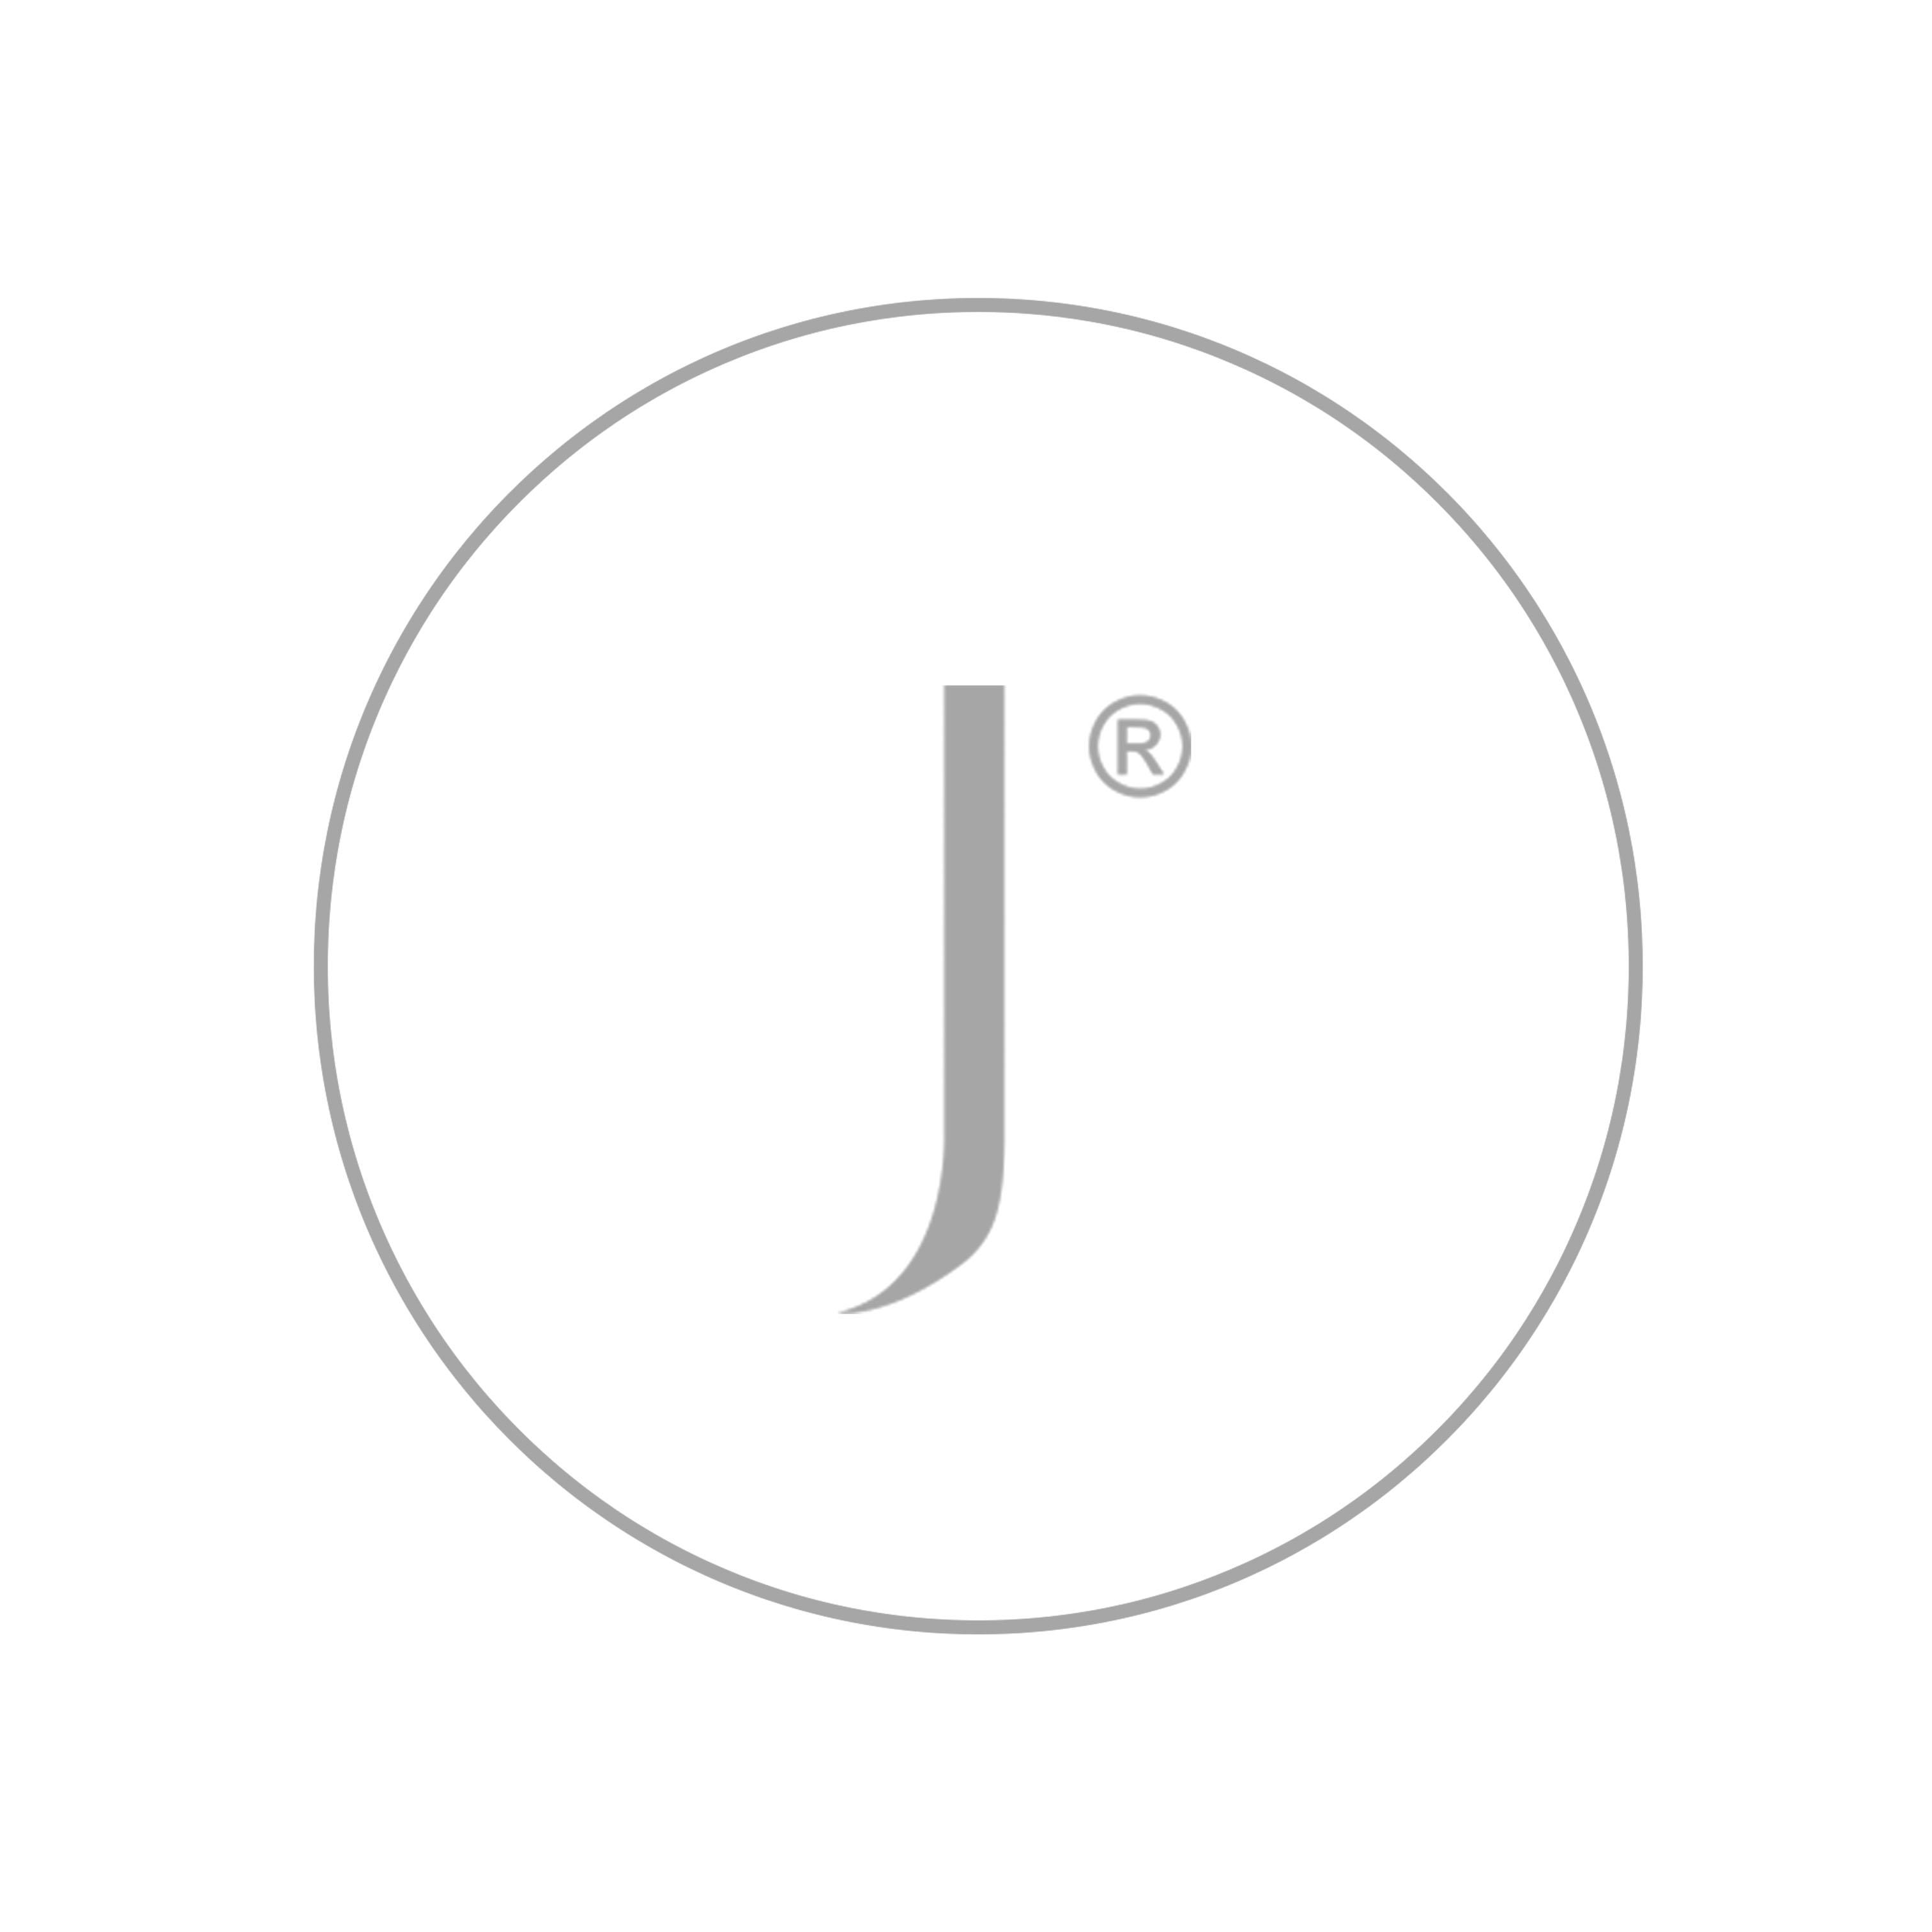 Rose Gold Omega Cuff Bracelet